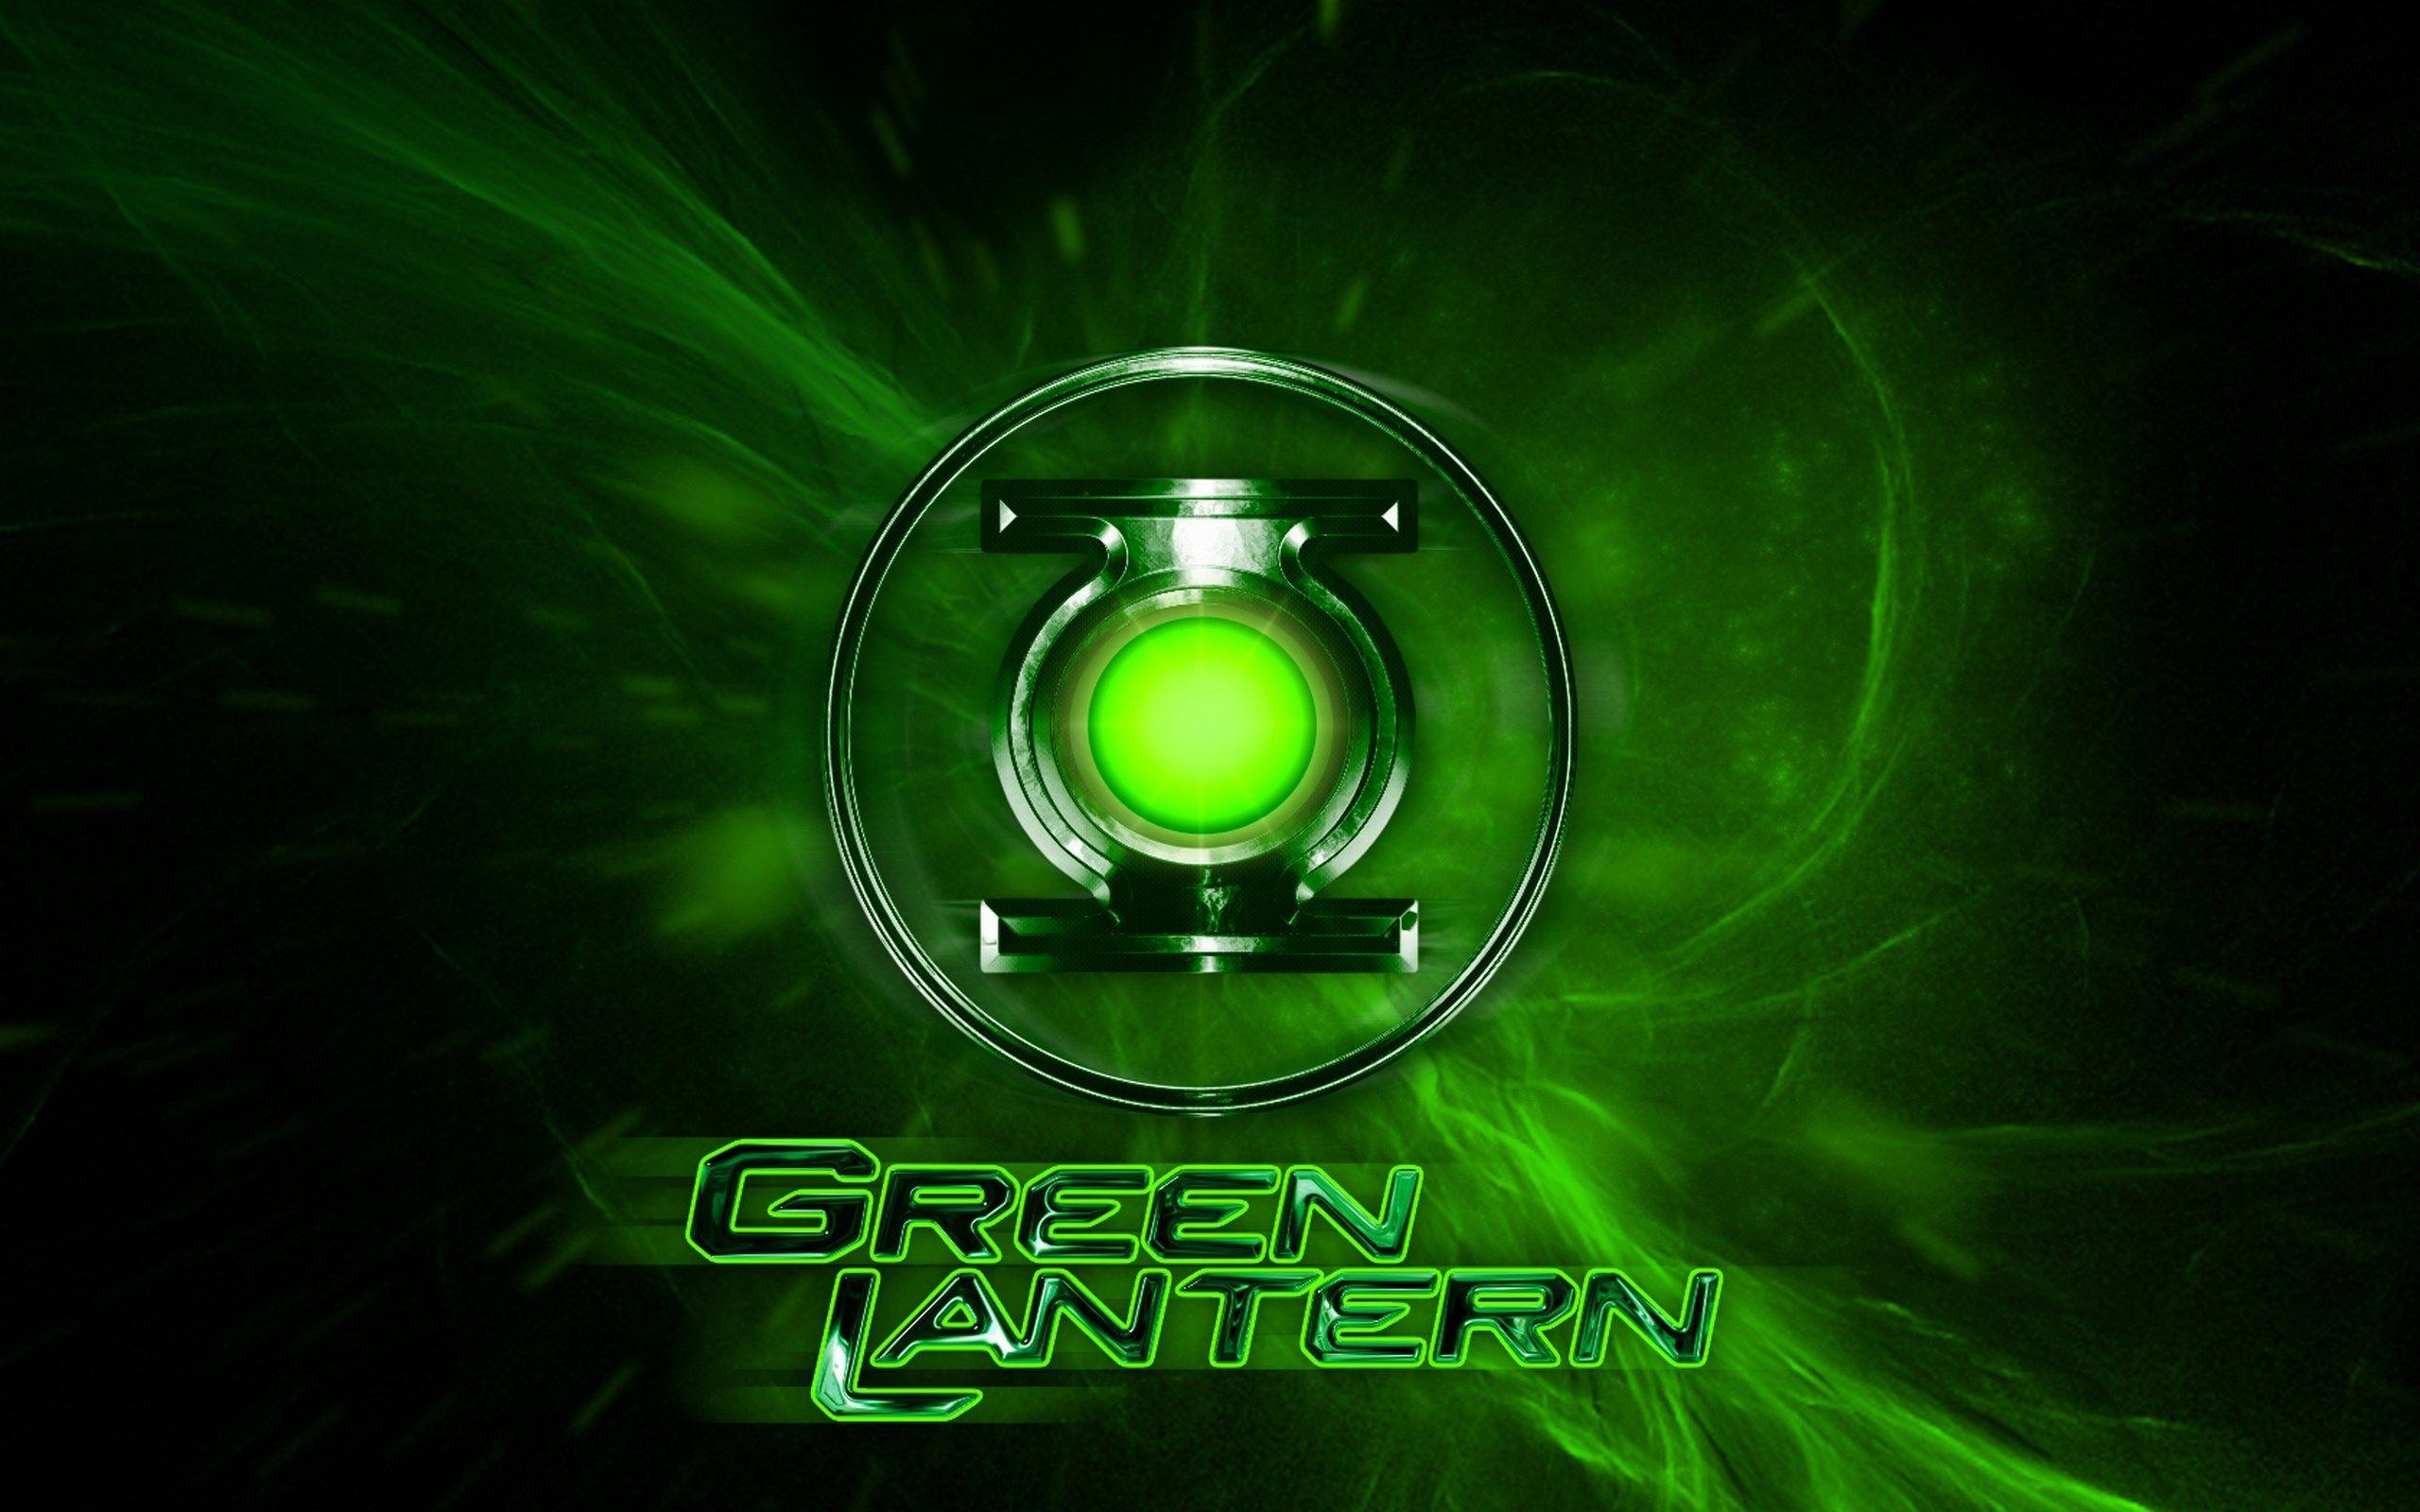 Green Lantern Wallpaper Picture – Wallpaper